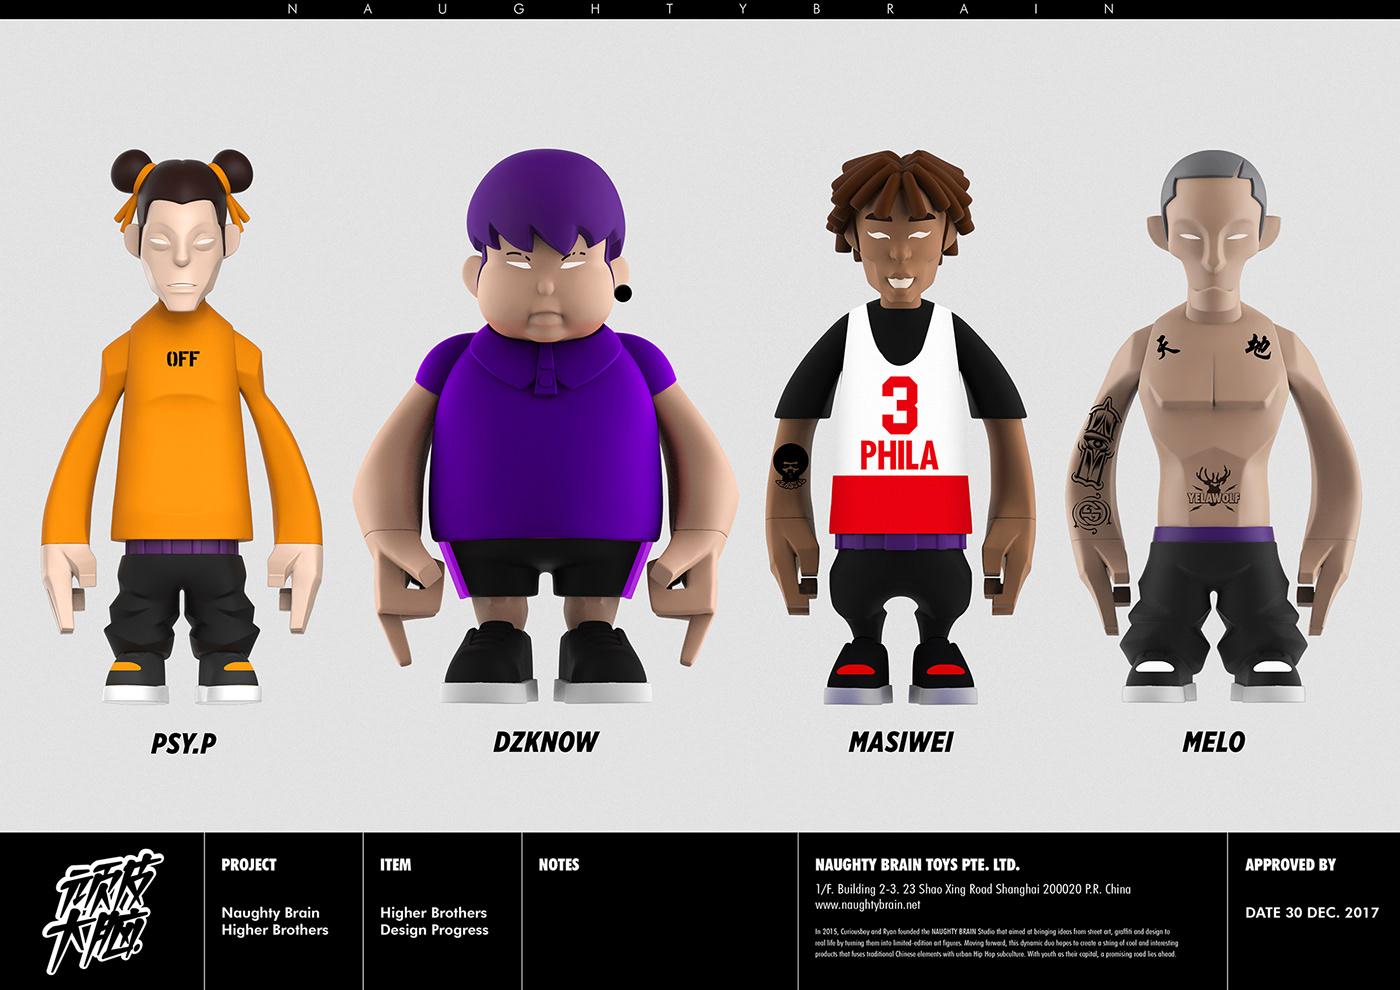 naughtybrain,CURIOUSBOY,higherbrothers,arttoy,hiphop,artfigure,designertoys,subculture,toydesign,toymaker